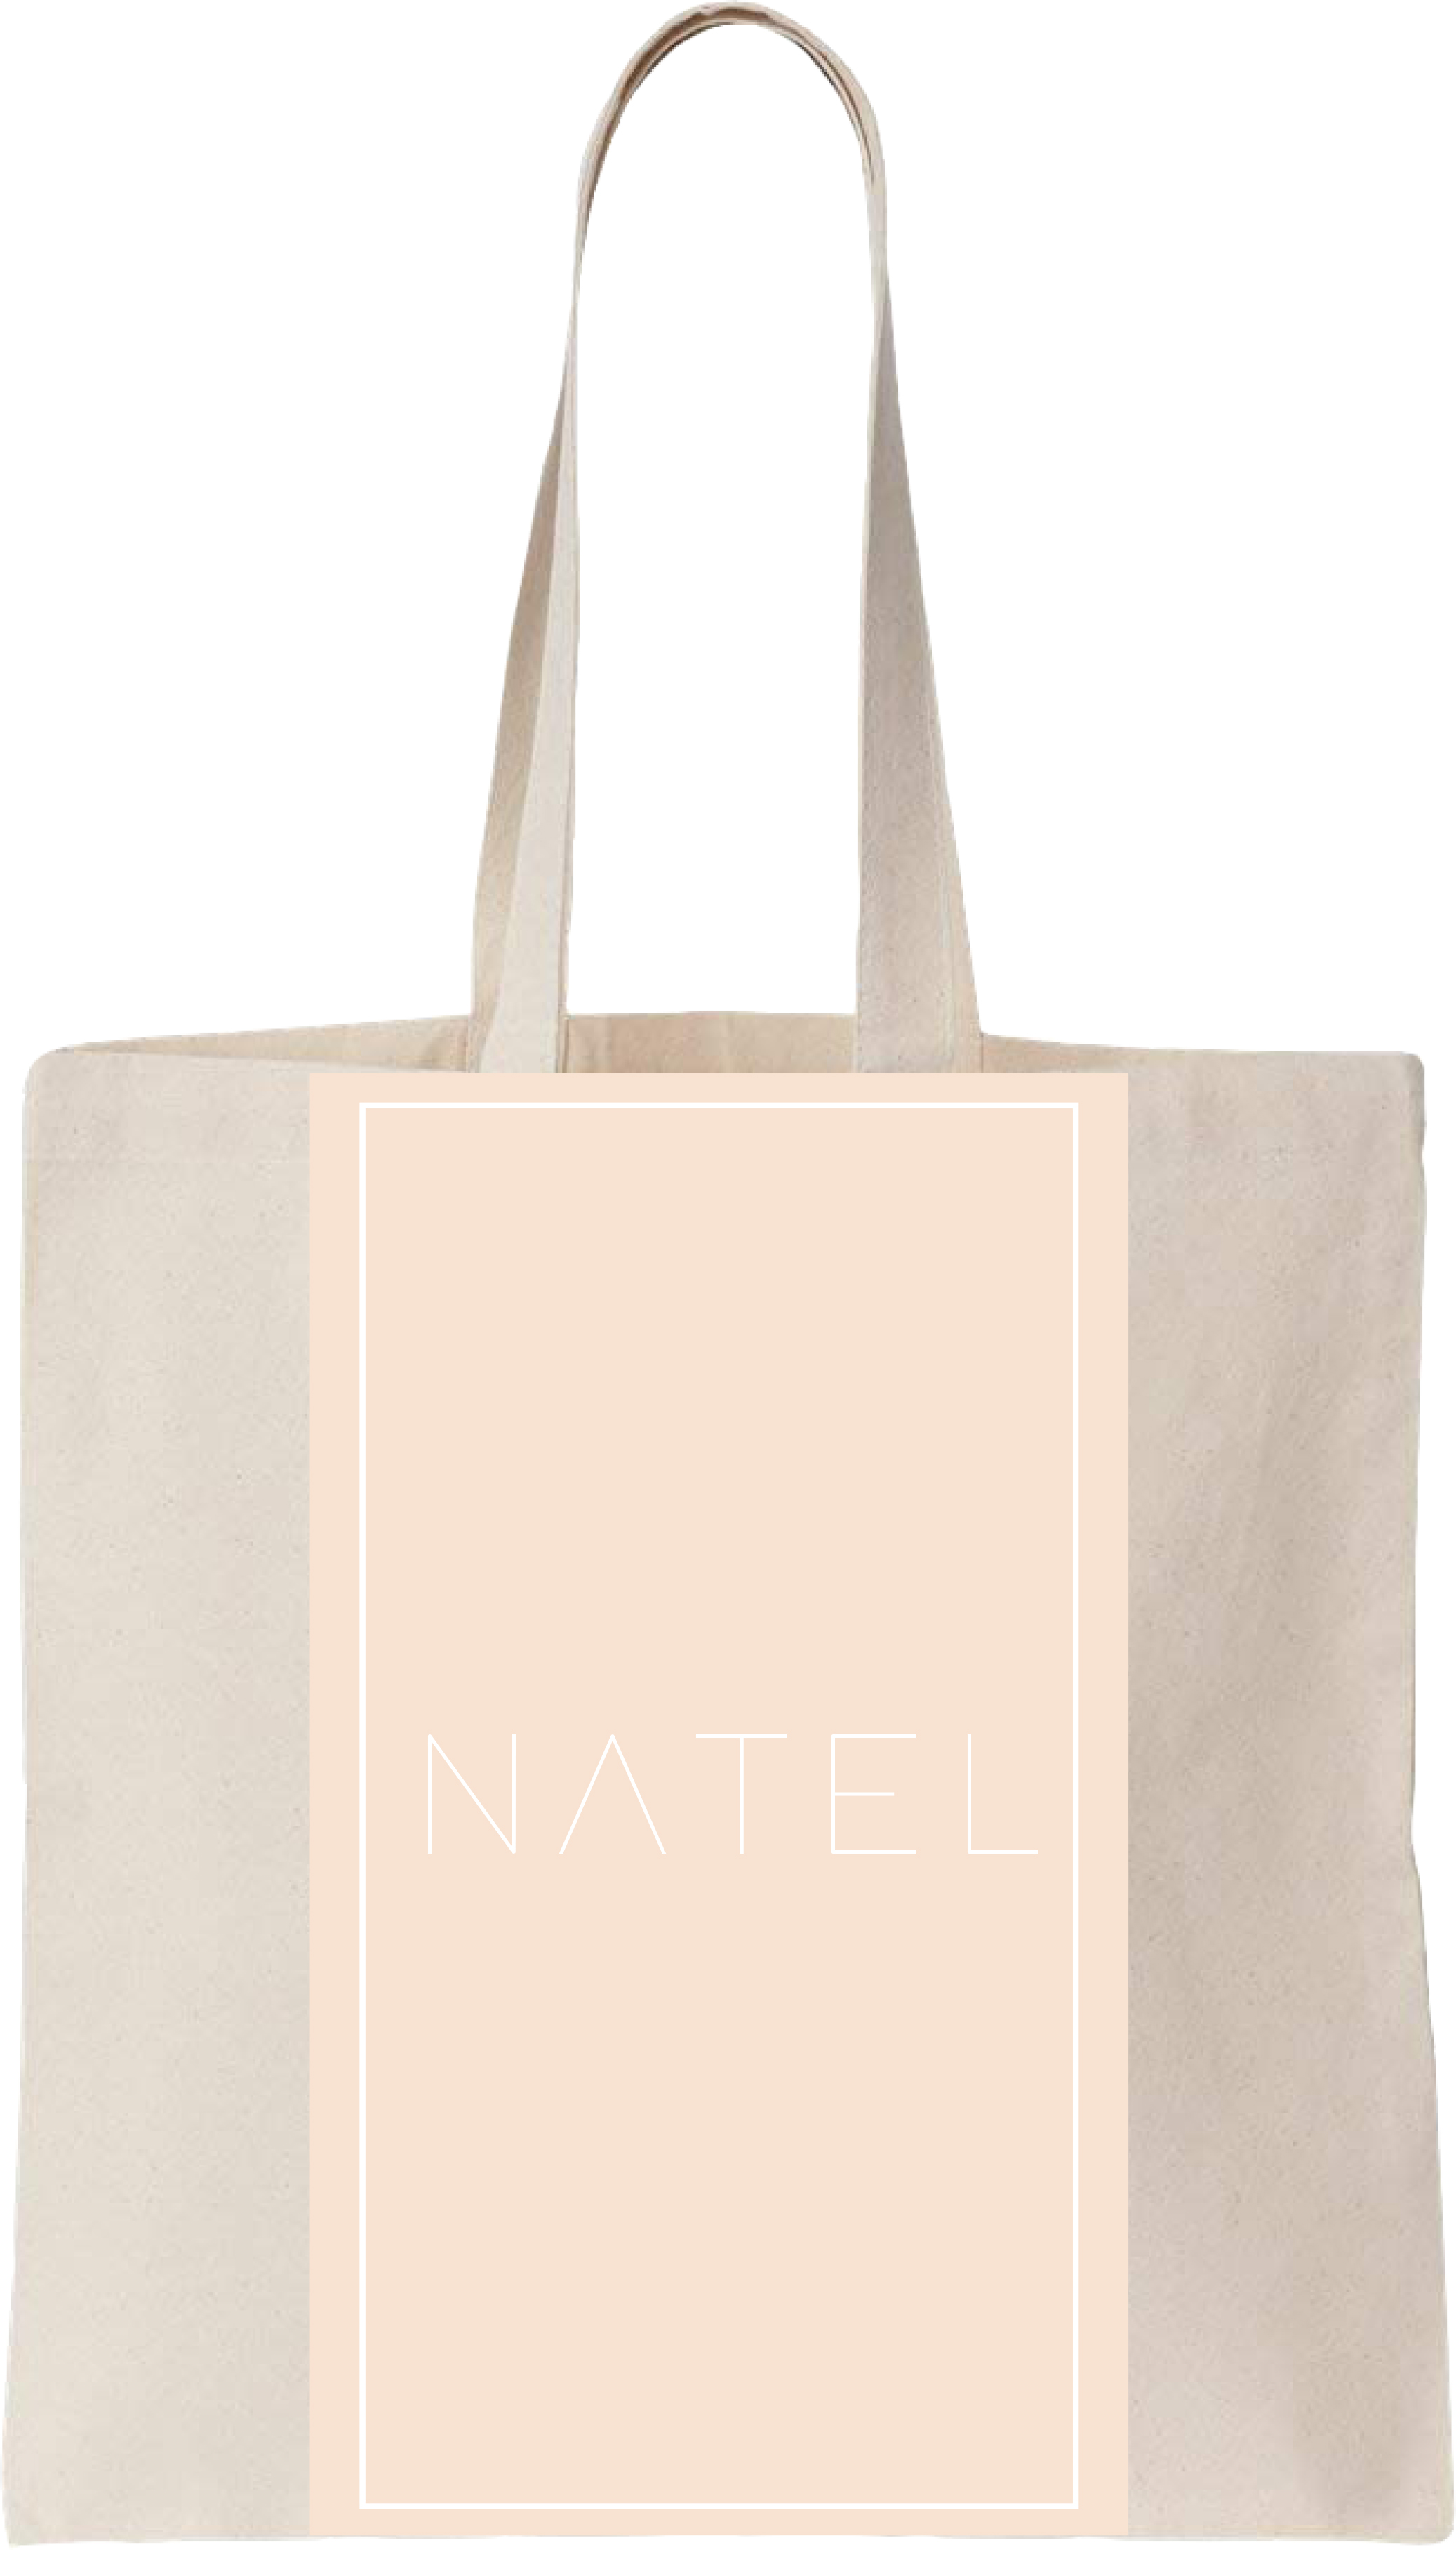 Nawal portfolio branding canvas.jpg